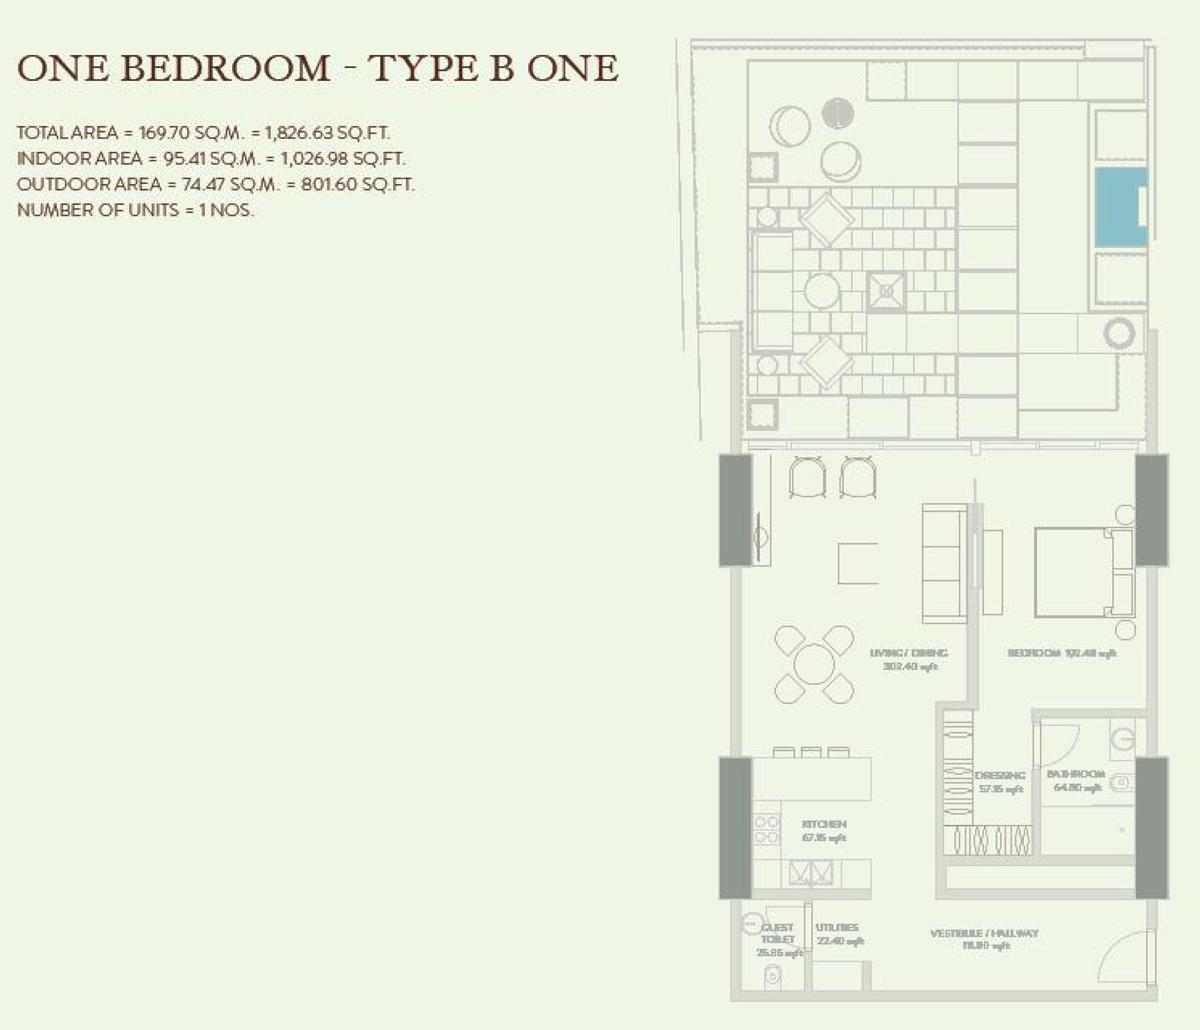 1 Bedroom  Type B 1 Size 1826.63 sq.ft